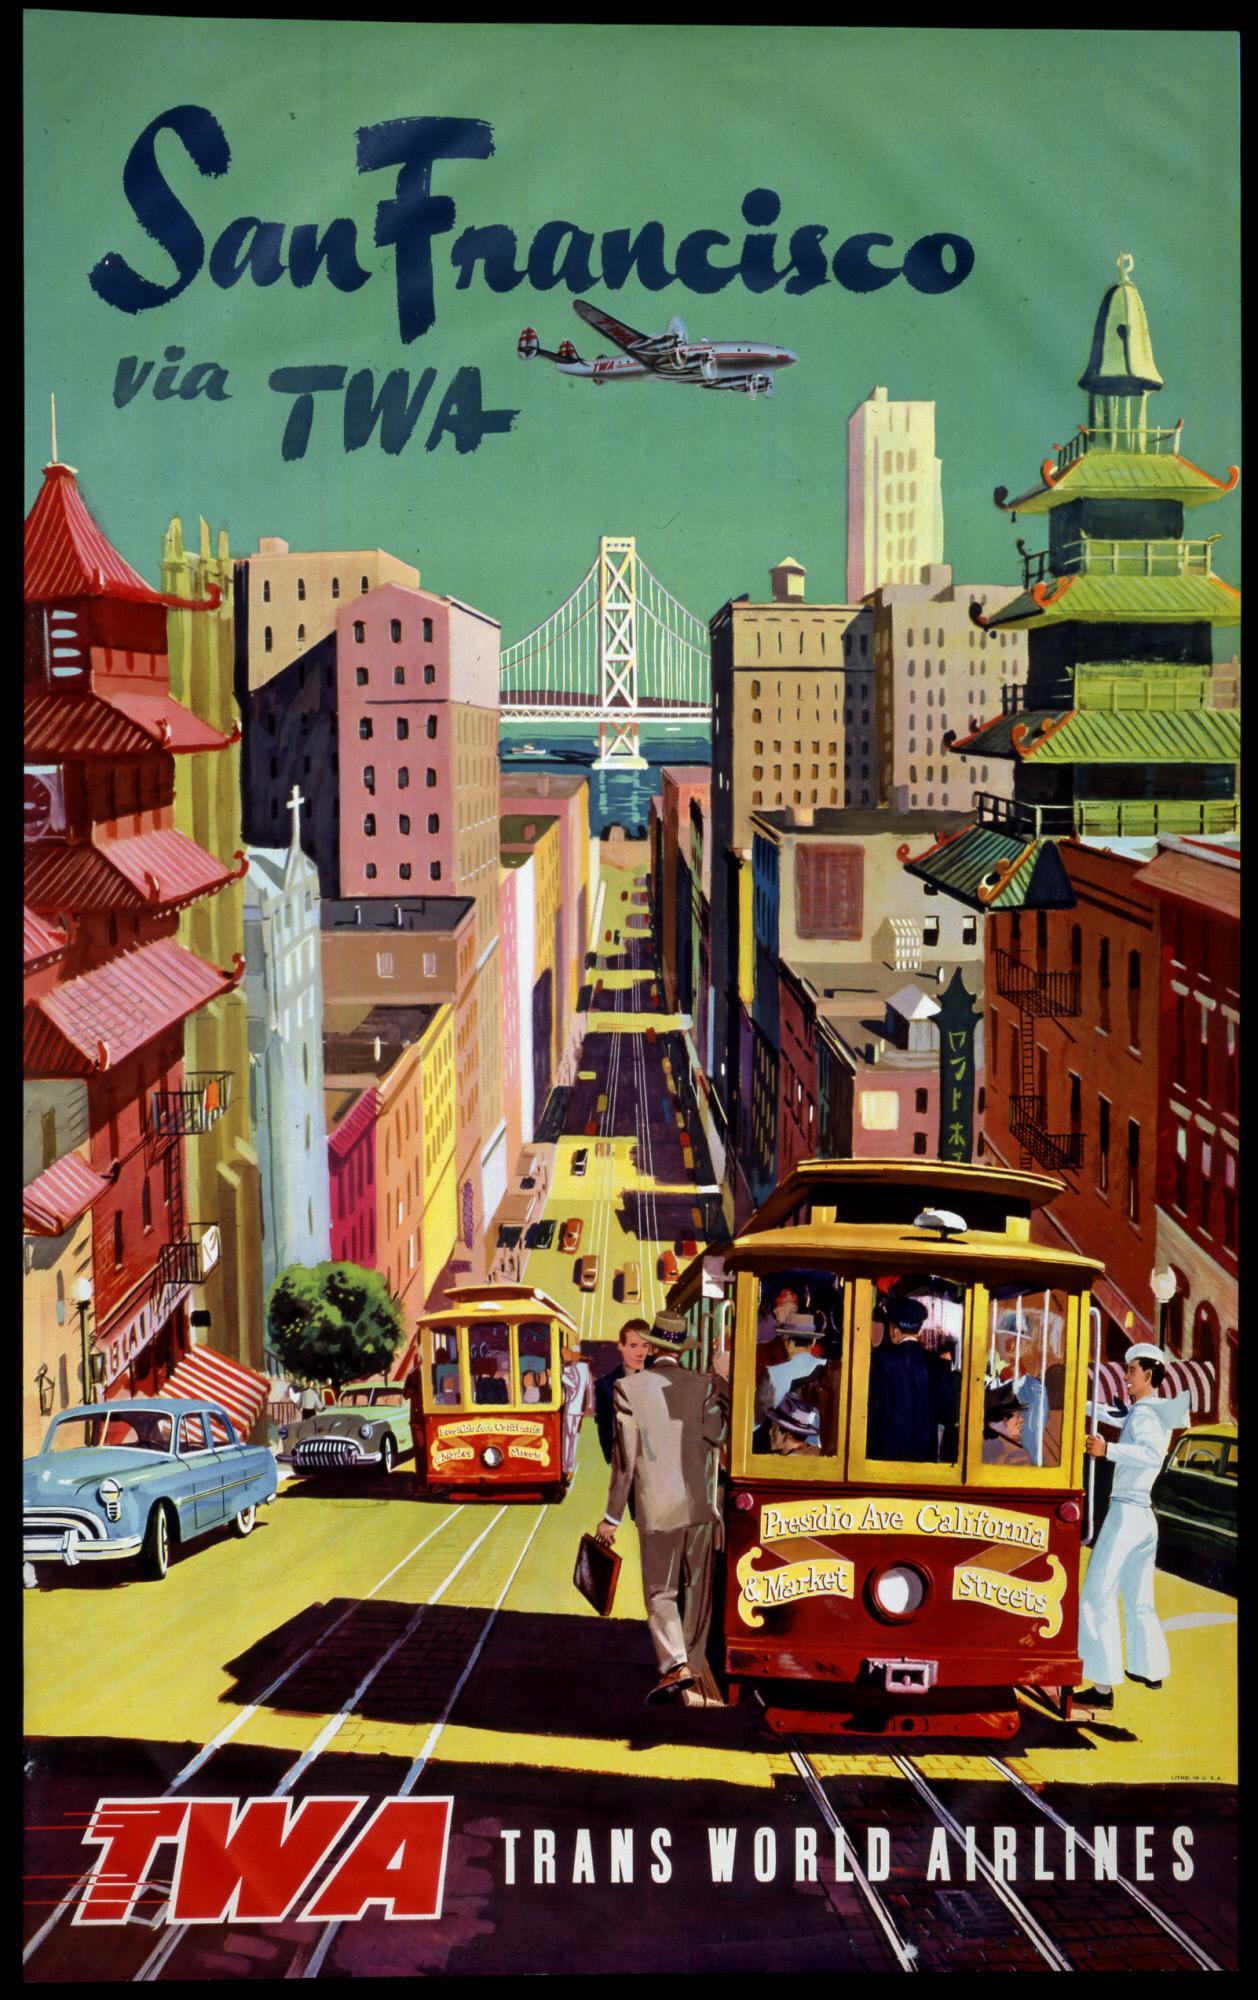 Superior Matted And Framed Vintage San Francisco Travel Poster   Image 3 Of 3